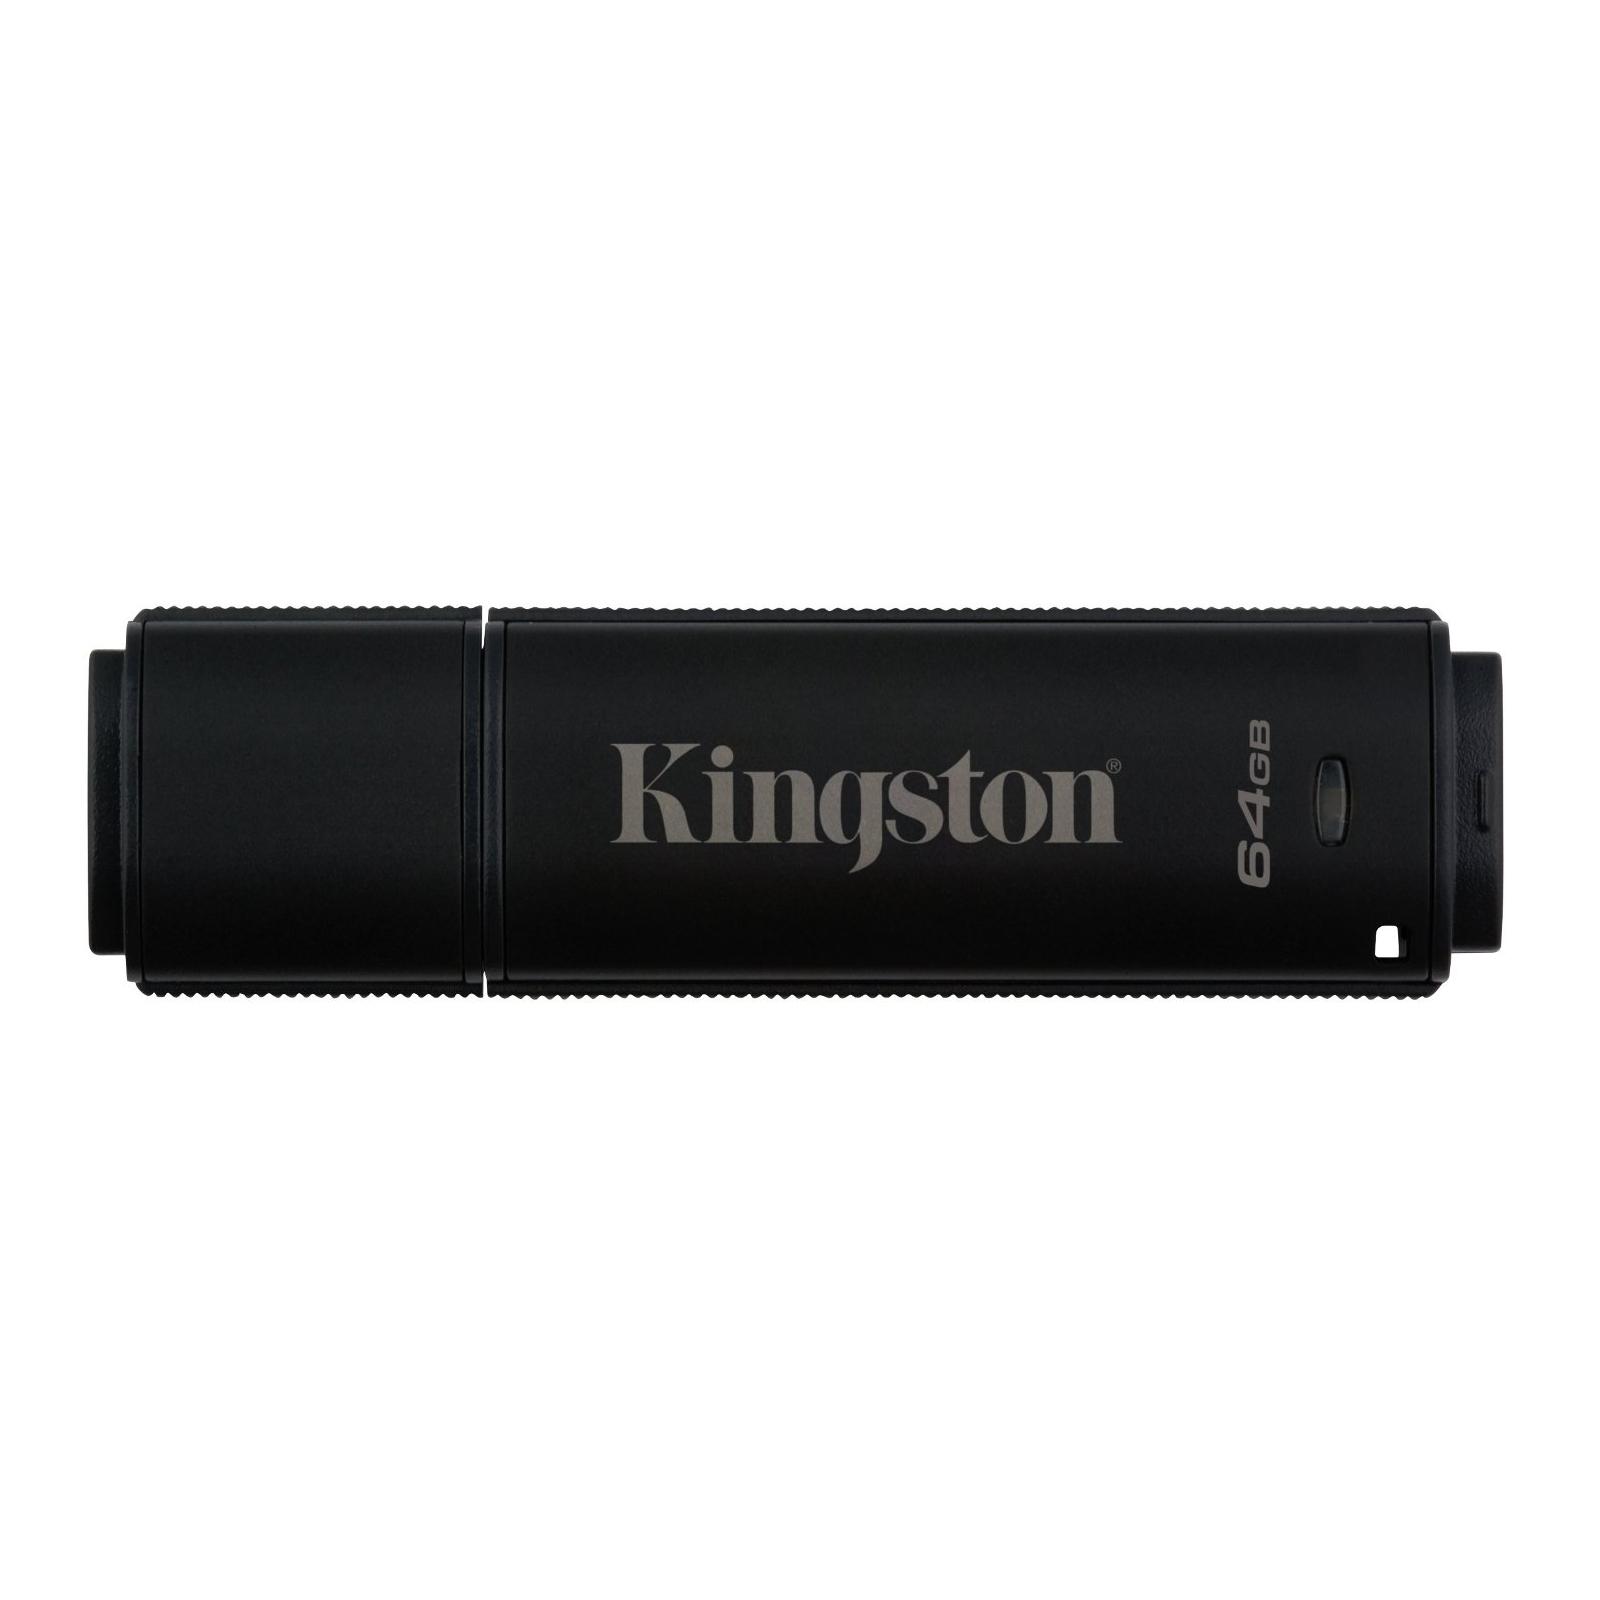 USB флеш накопитель Kingston 64GB DataTraveler 4000 G2 Metal Black USB 3.0 (DT4000G2/64GB)